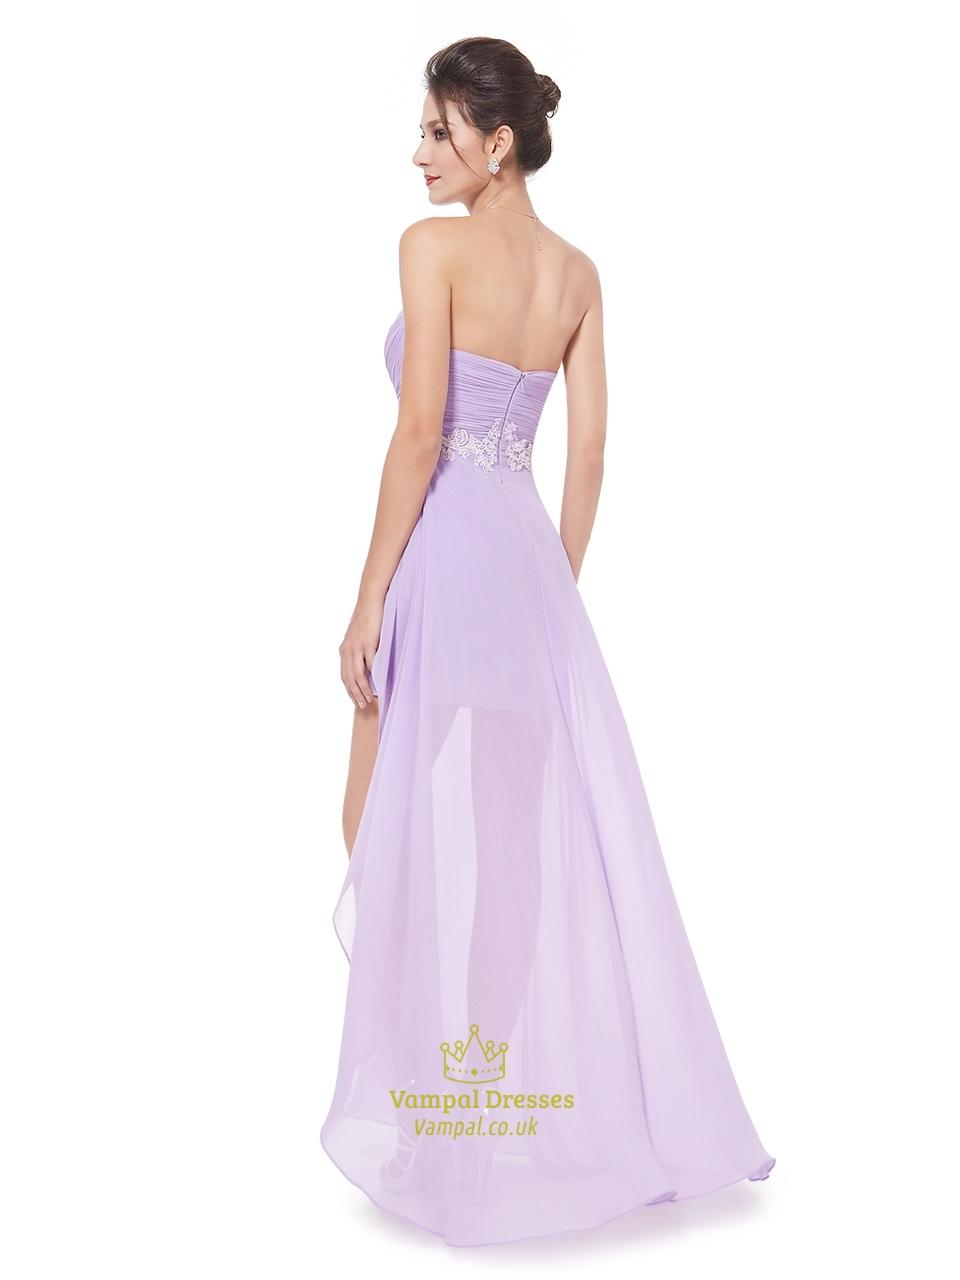 lilac chiffon sweetheart high low bridesmaid dress with